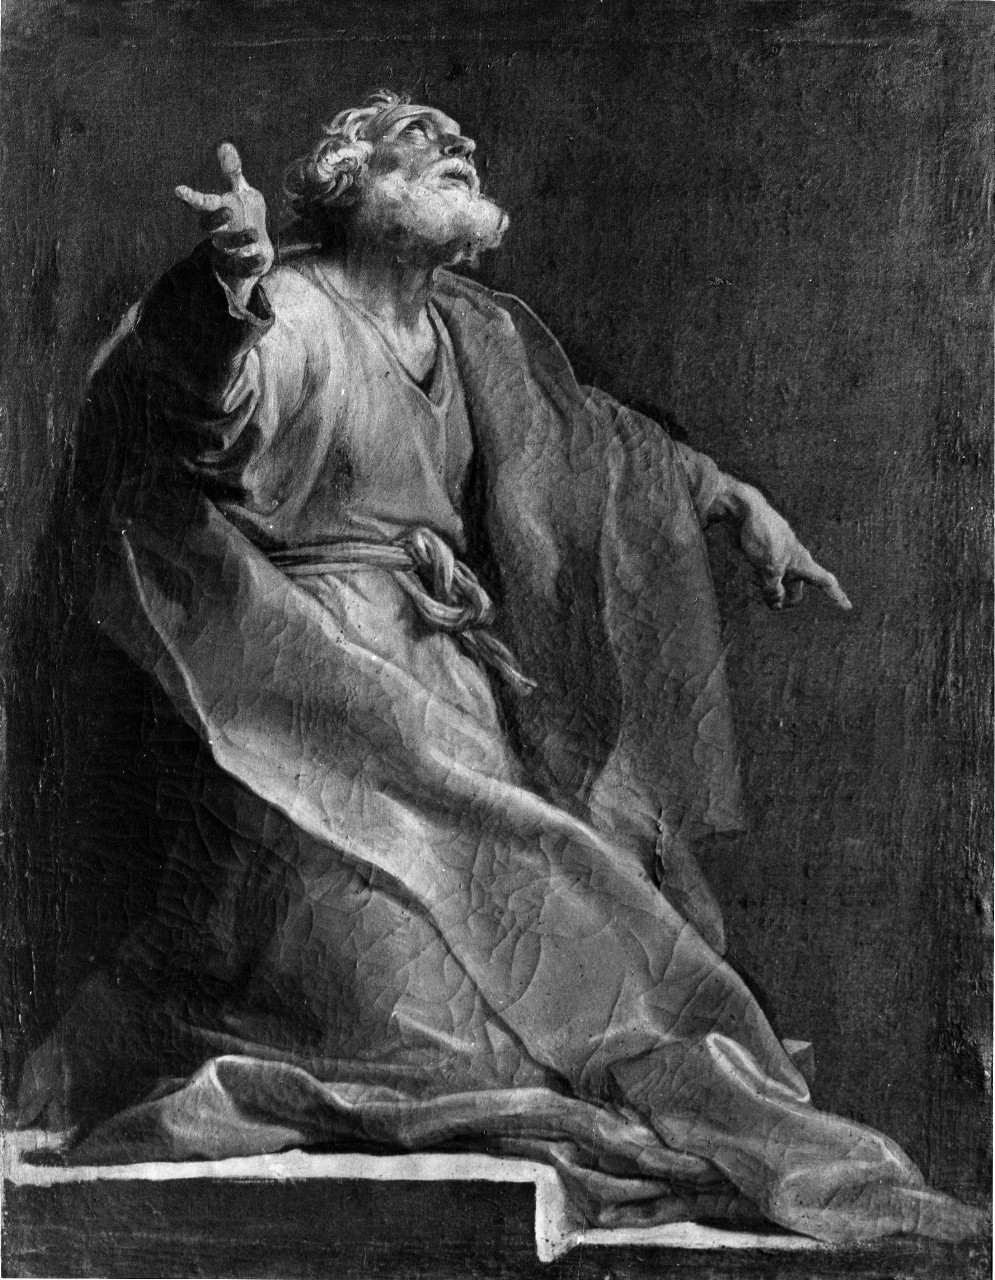 San Pietro (dipinto) di Batoni Pompeo (sec. XVIII)